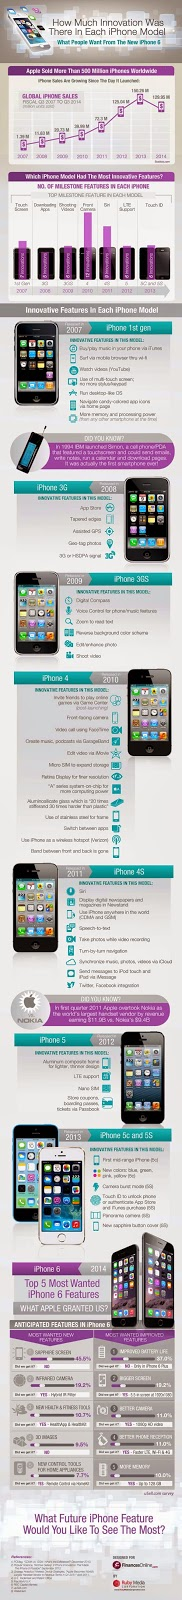 Infografis iPhone Dari Waktu Ke Waktu - Panduan Membeli iPhone 6